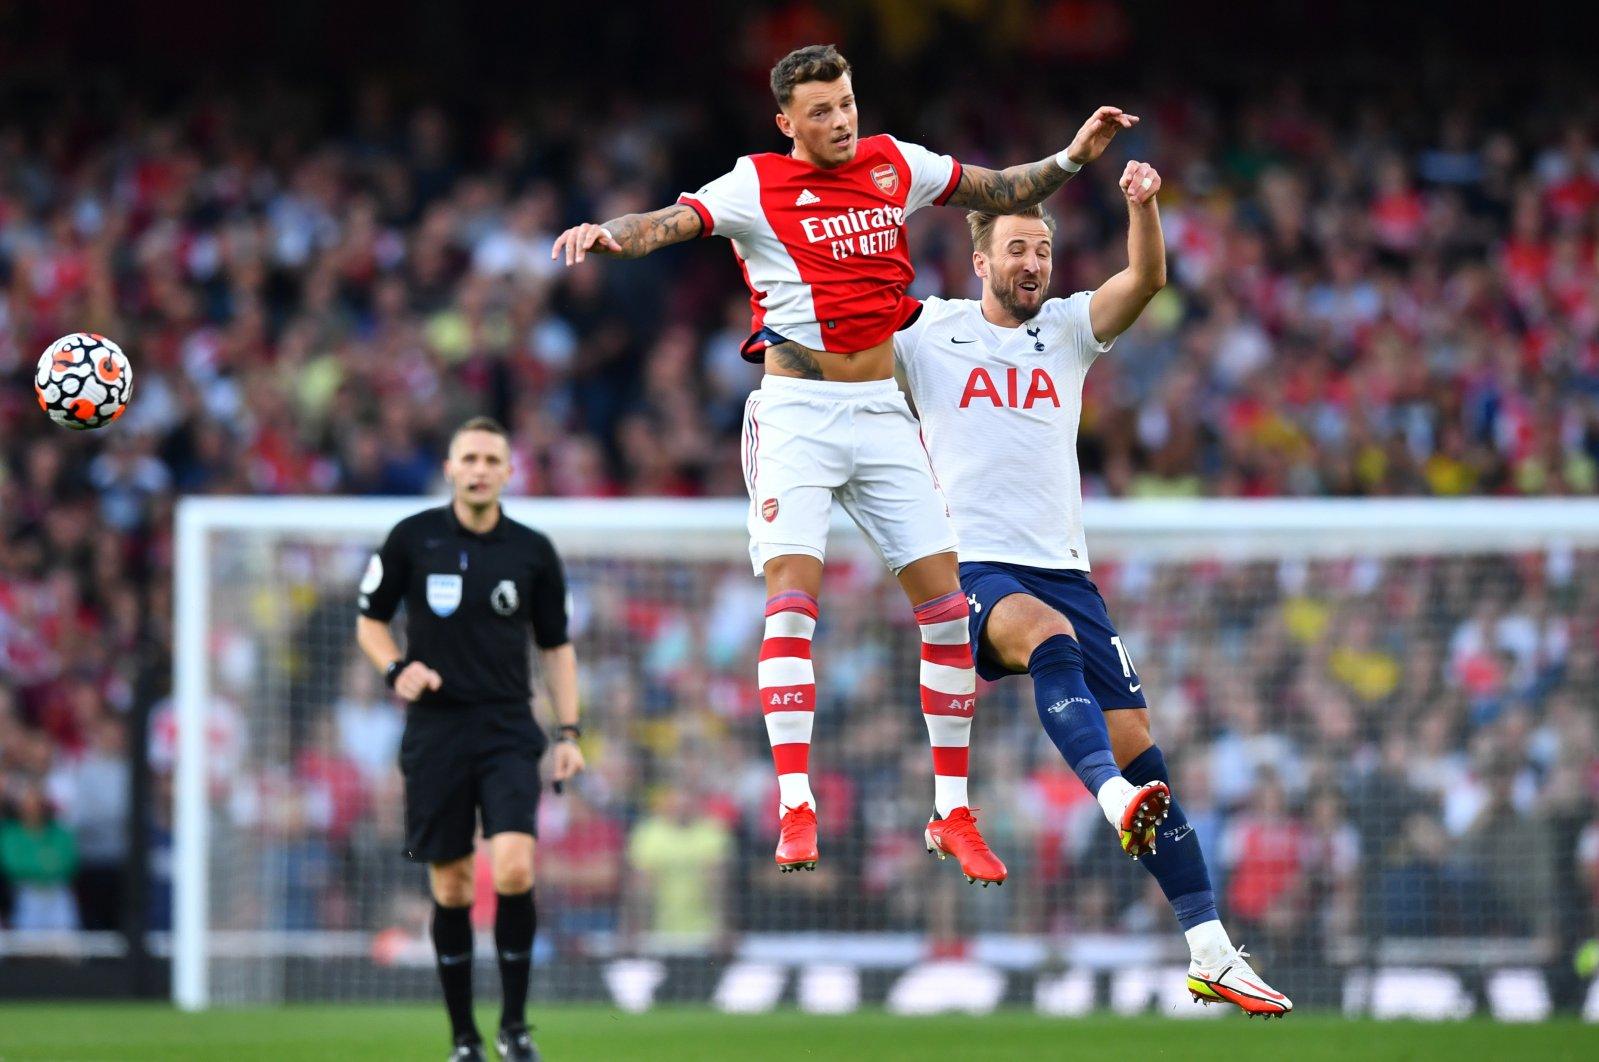 The Premier League Arsenal versus Tottenham Hotspur football game in Emirates Stadium, London, Britain, Sept. 26, 2021. (Reuters Photo)